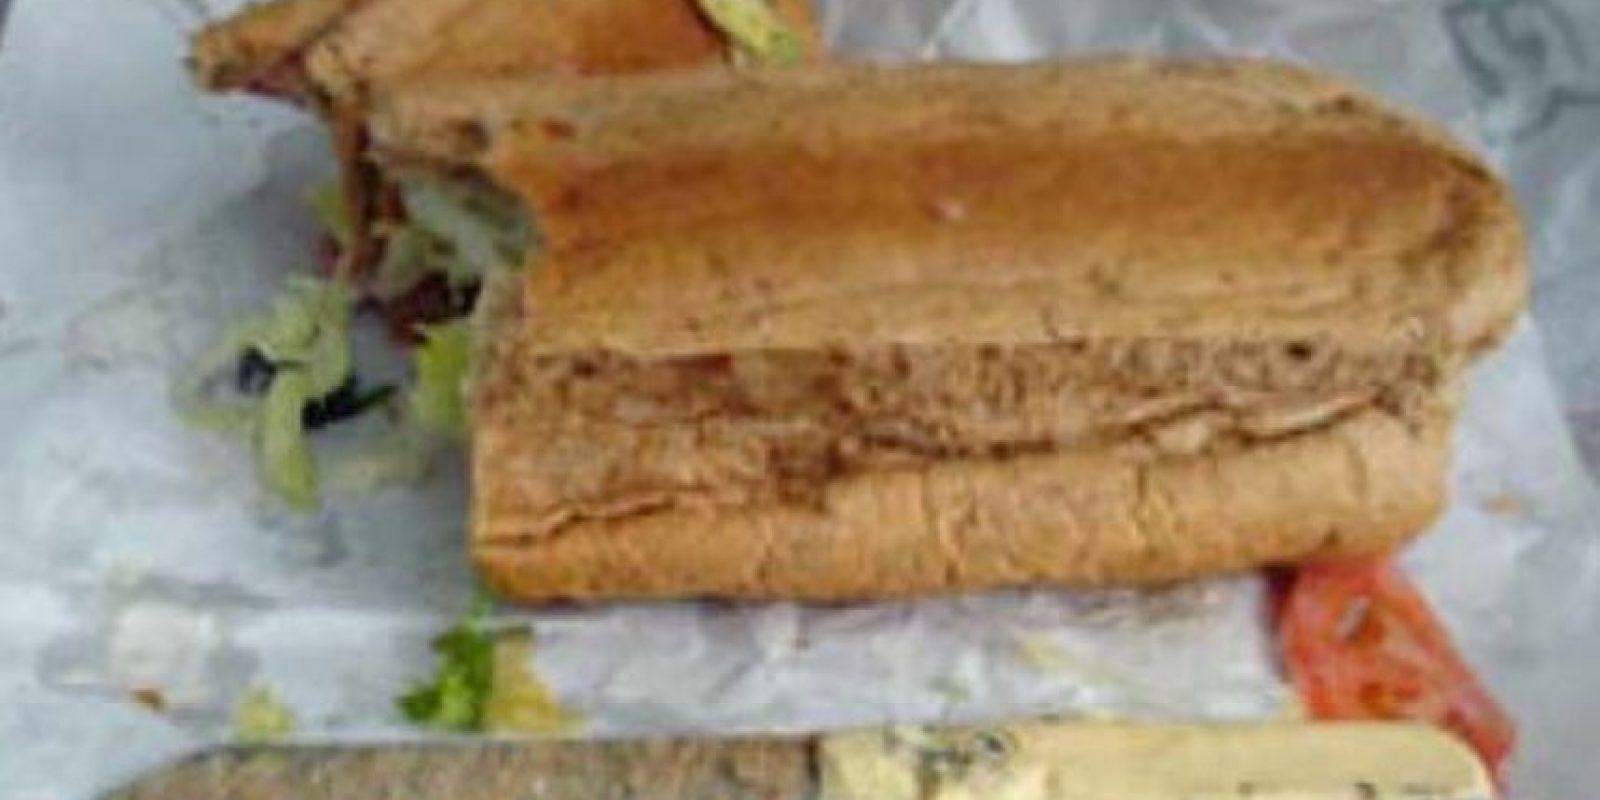 Cuchillo para partir el sandwich Foto:Viralnova